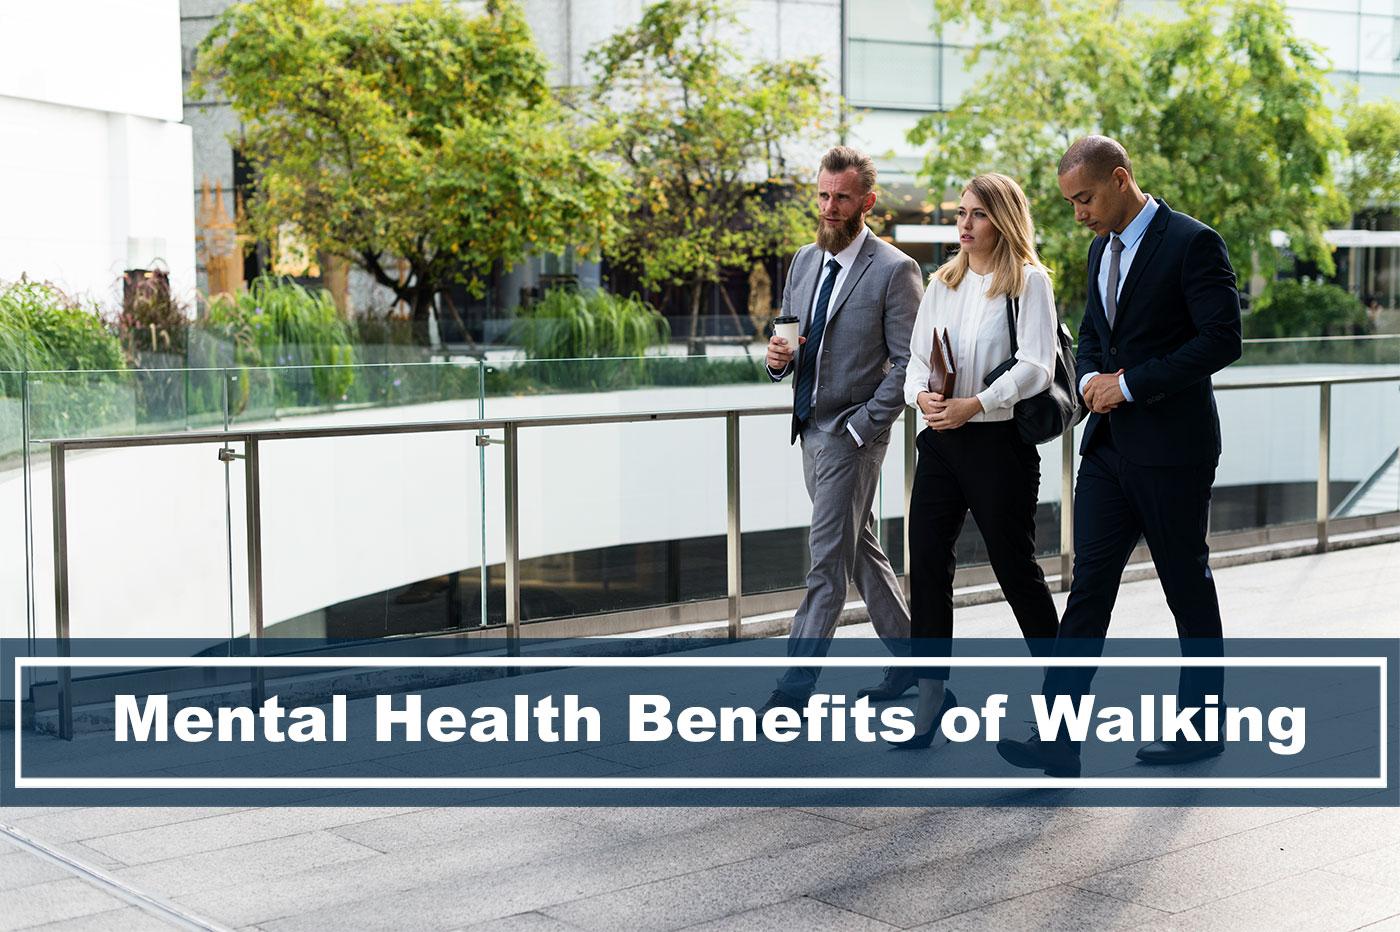 mental health benefits of walking